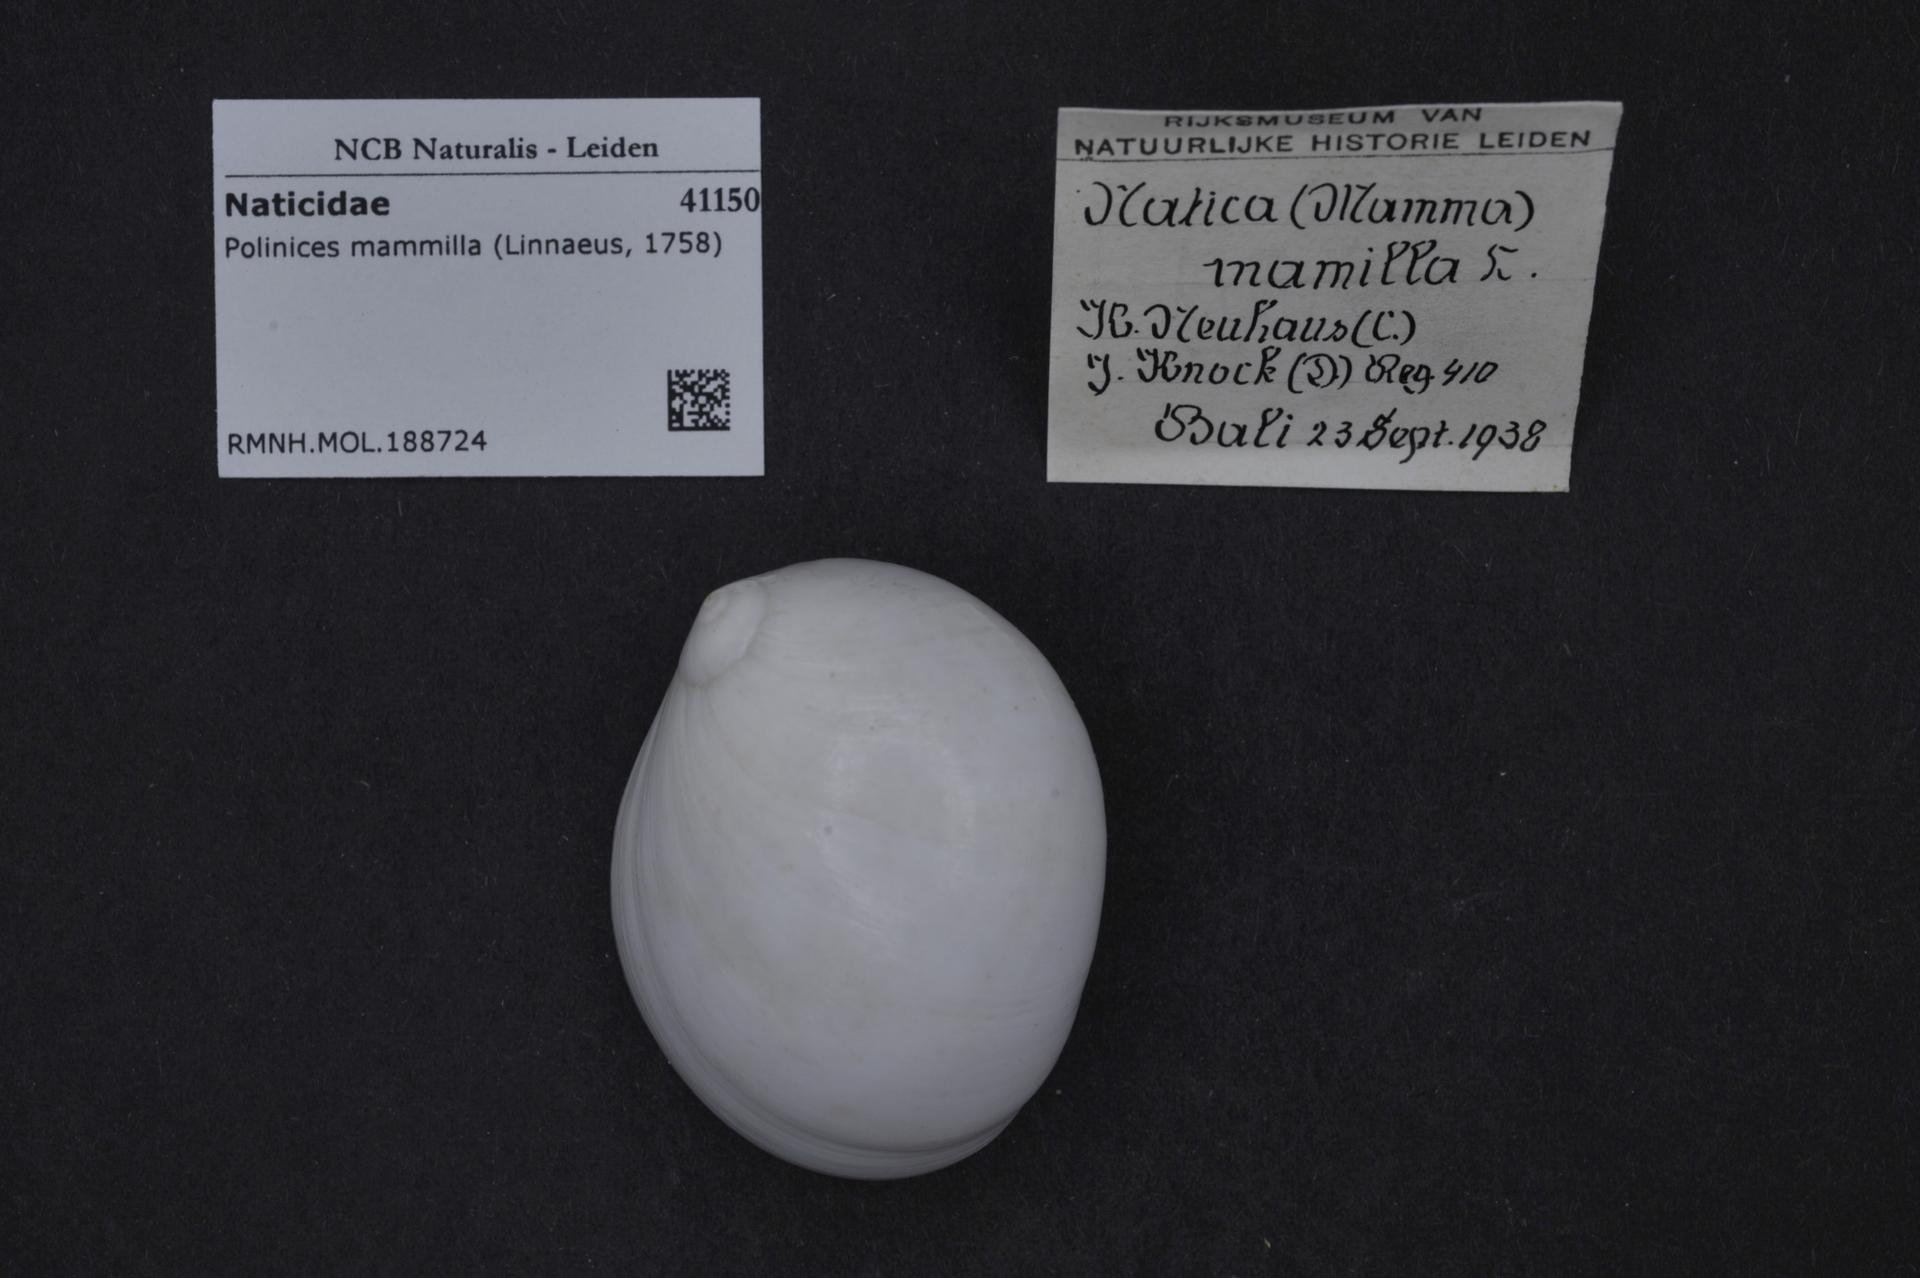 RMNH.MOL.188724 | Polinices mammilla (Linnaeus, 1758)